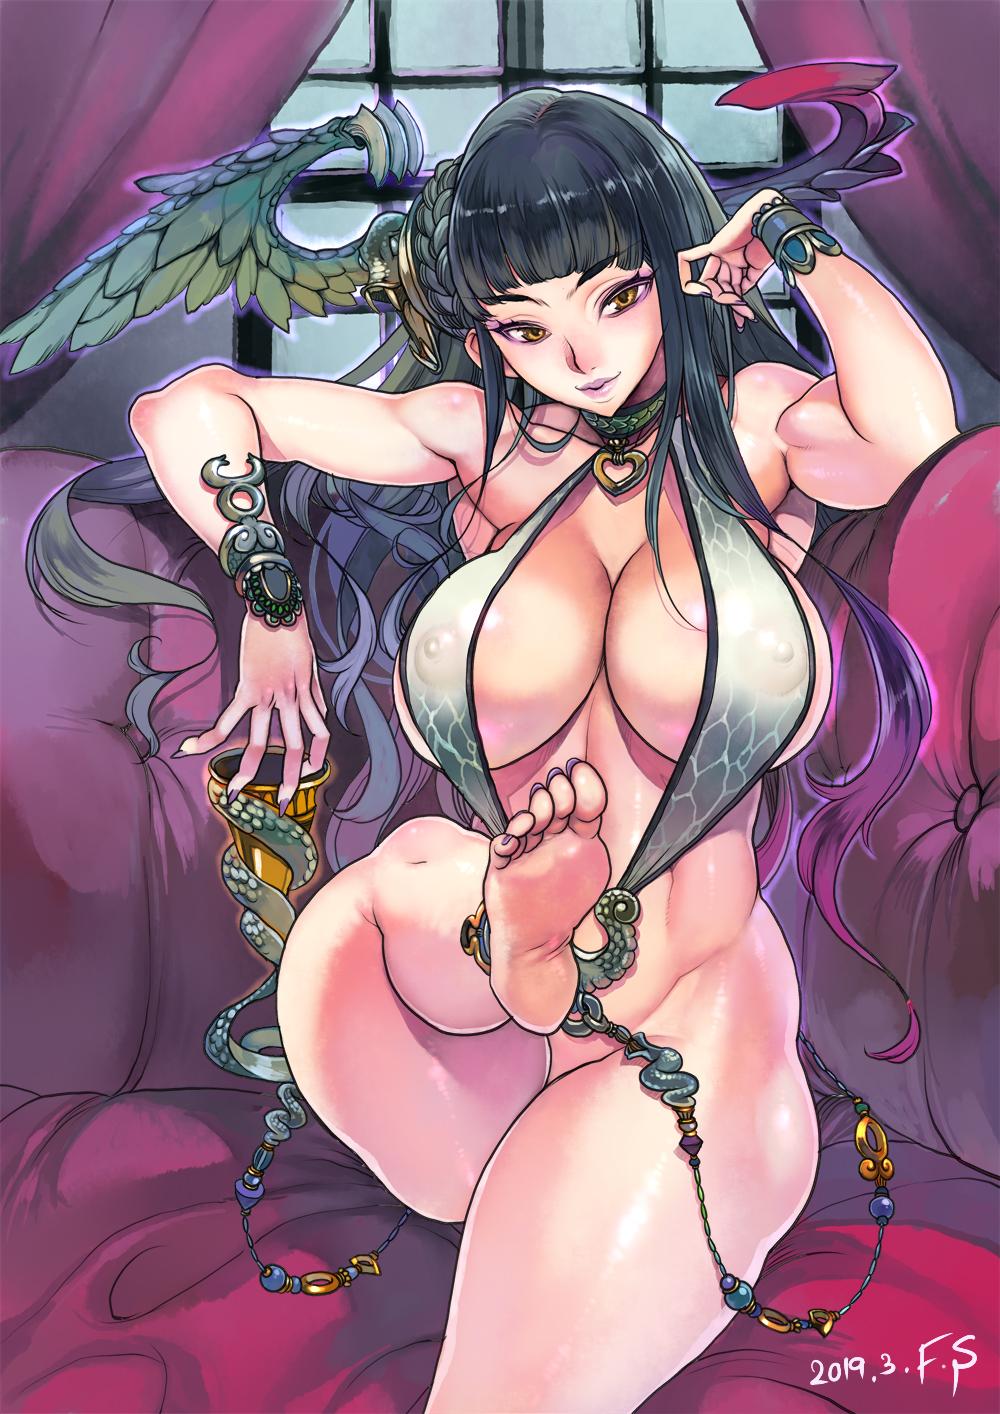 Anime Com Hentai wallpaper : anime girls, hentai, big boobs, xxfsxx 1000x1414